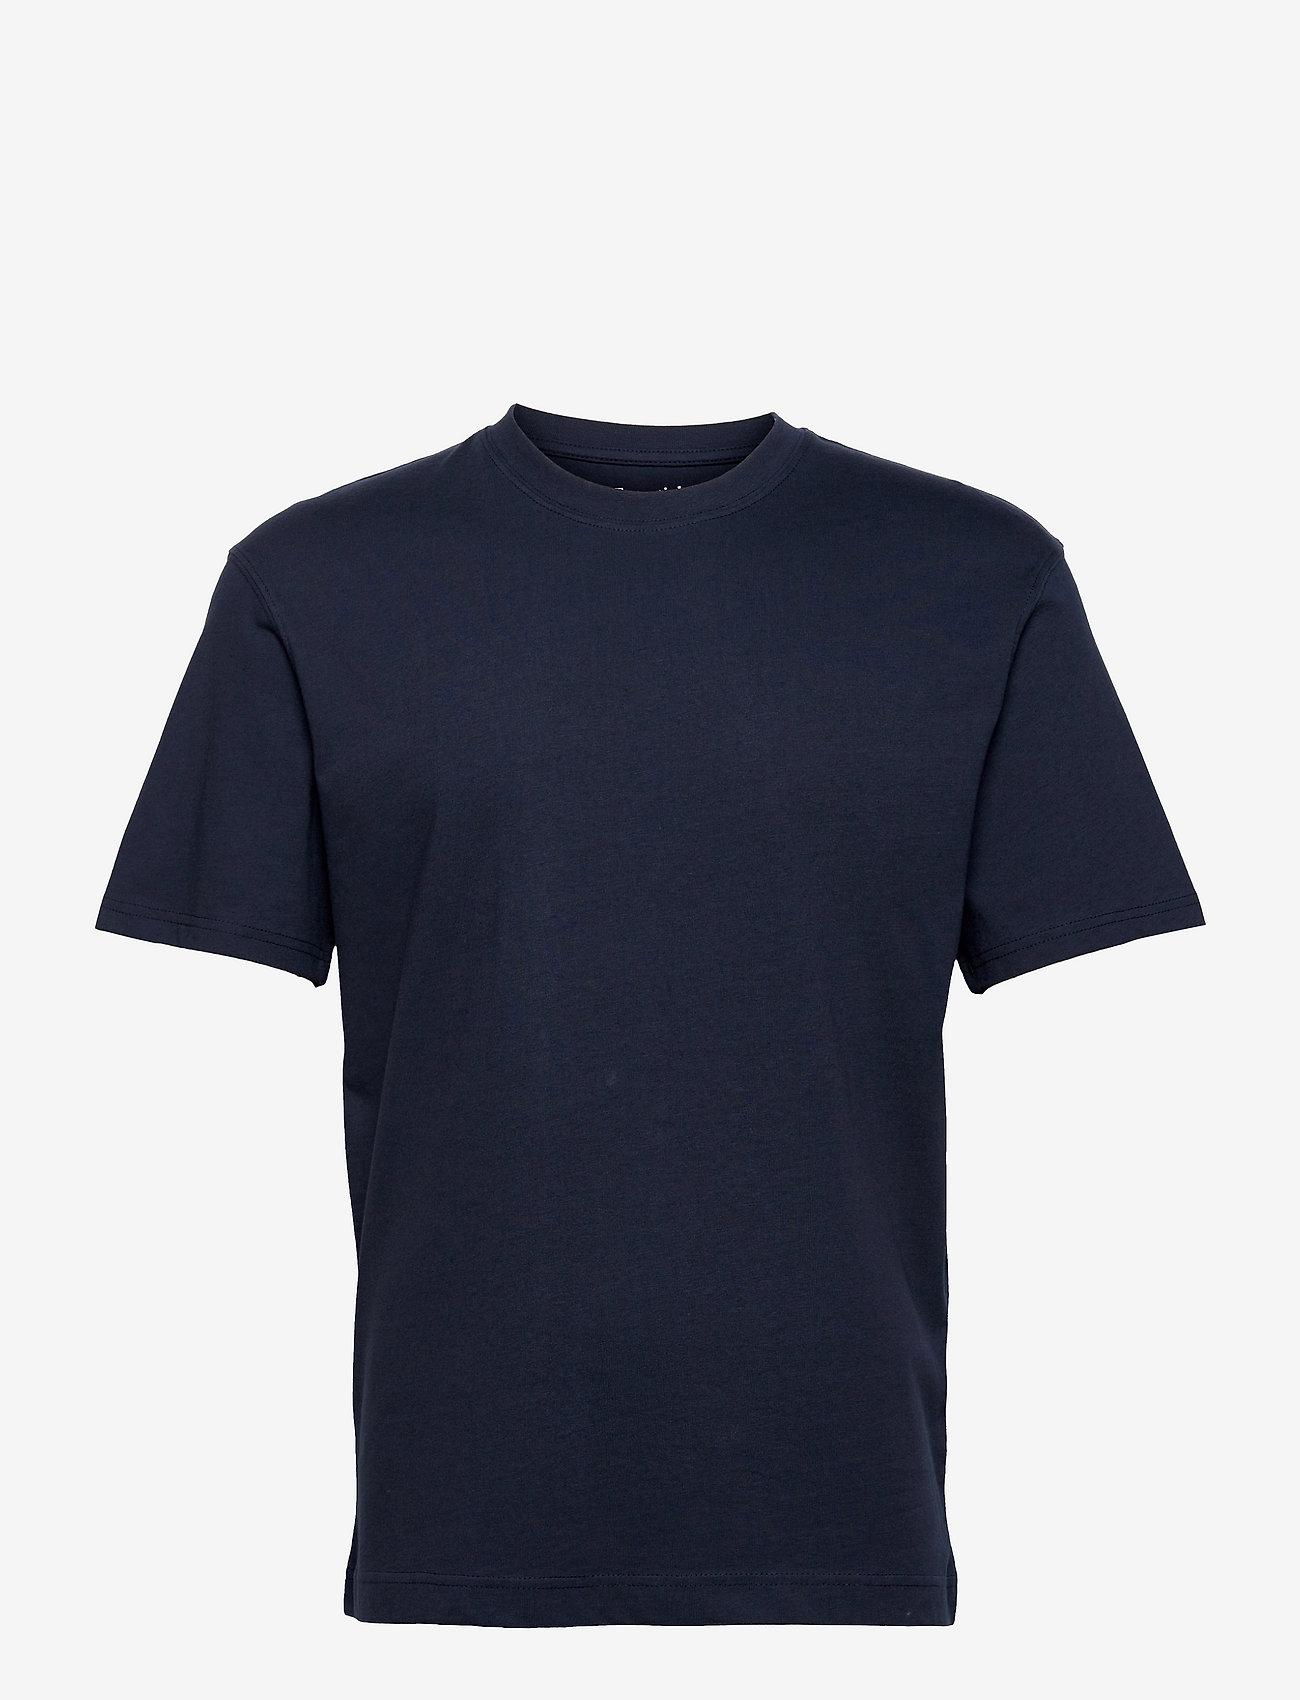 Jack & Jones - JJERELAXED TEE SS O-NECK - basic t-shirts - navy blazer - 0